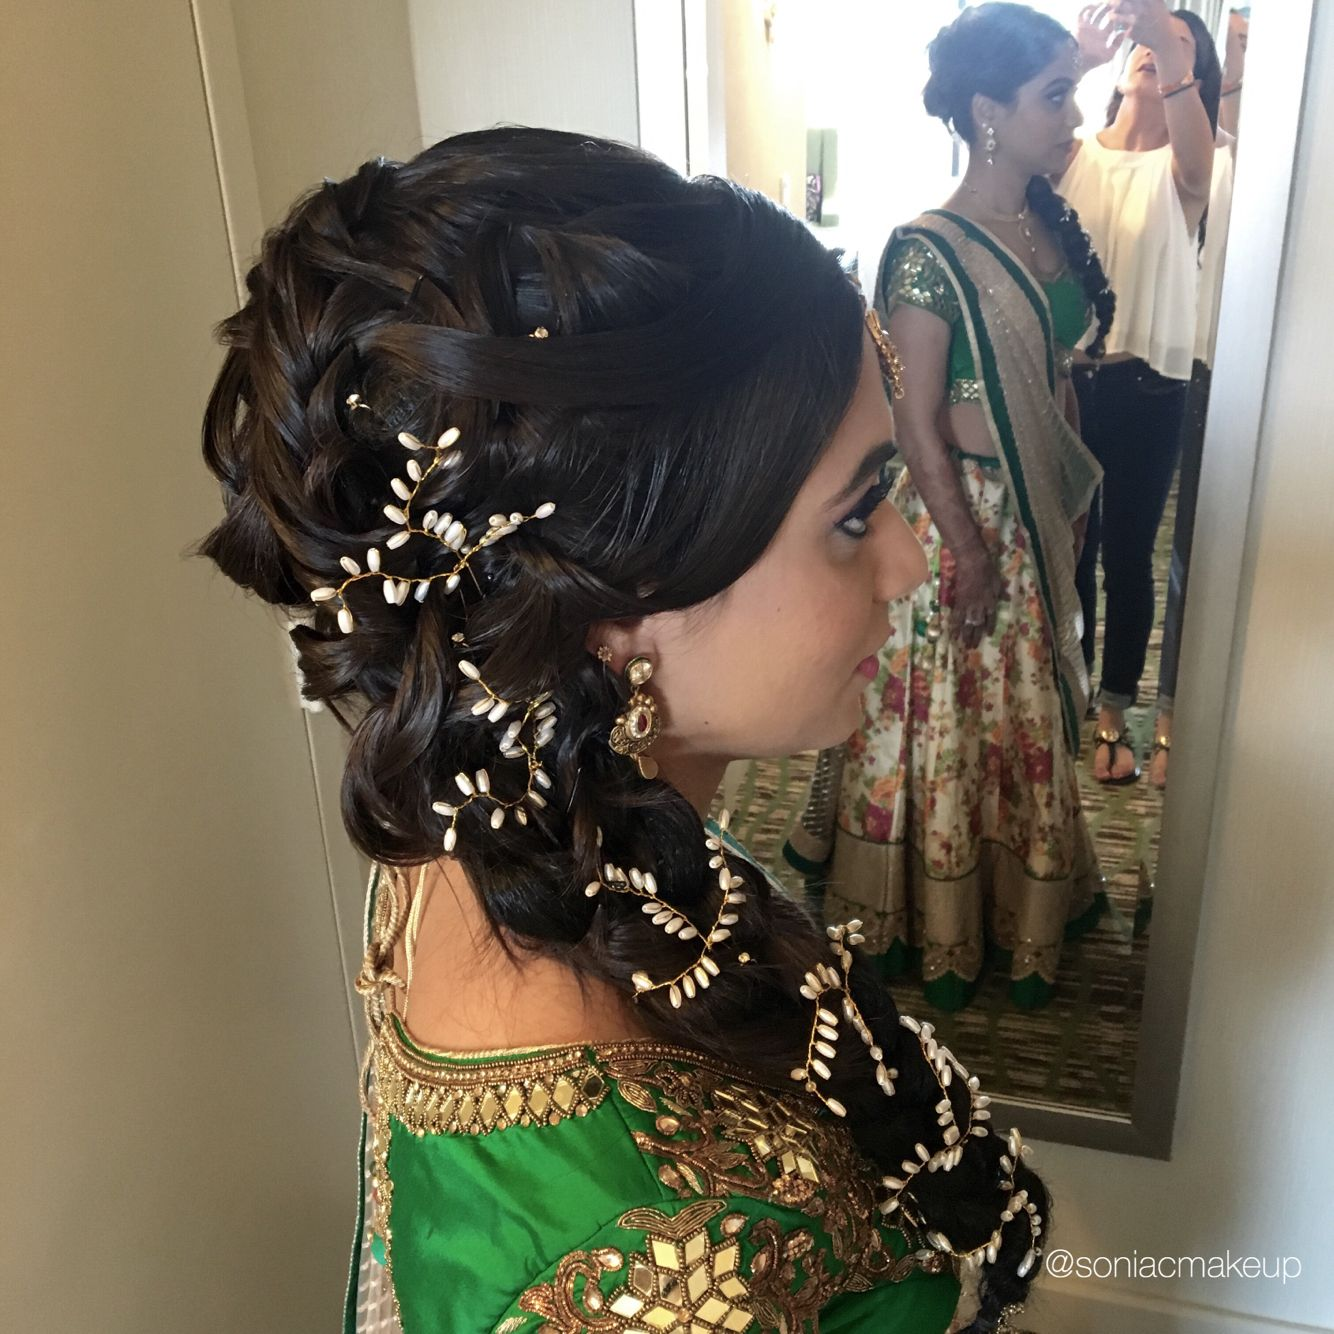 braided hair with pearl pins, braided updo, indian wedding hair